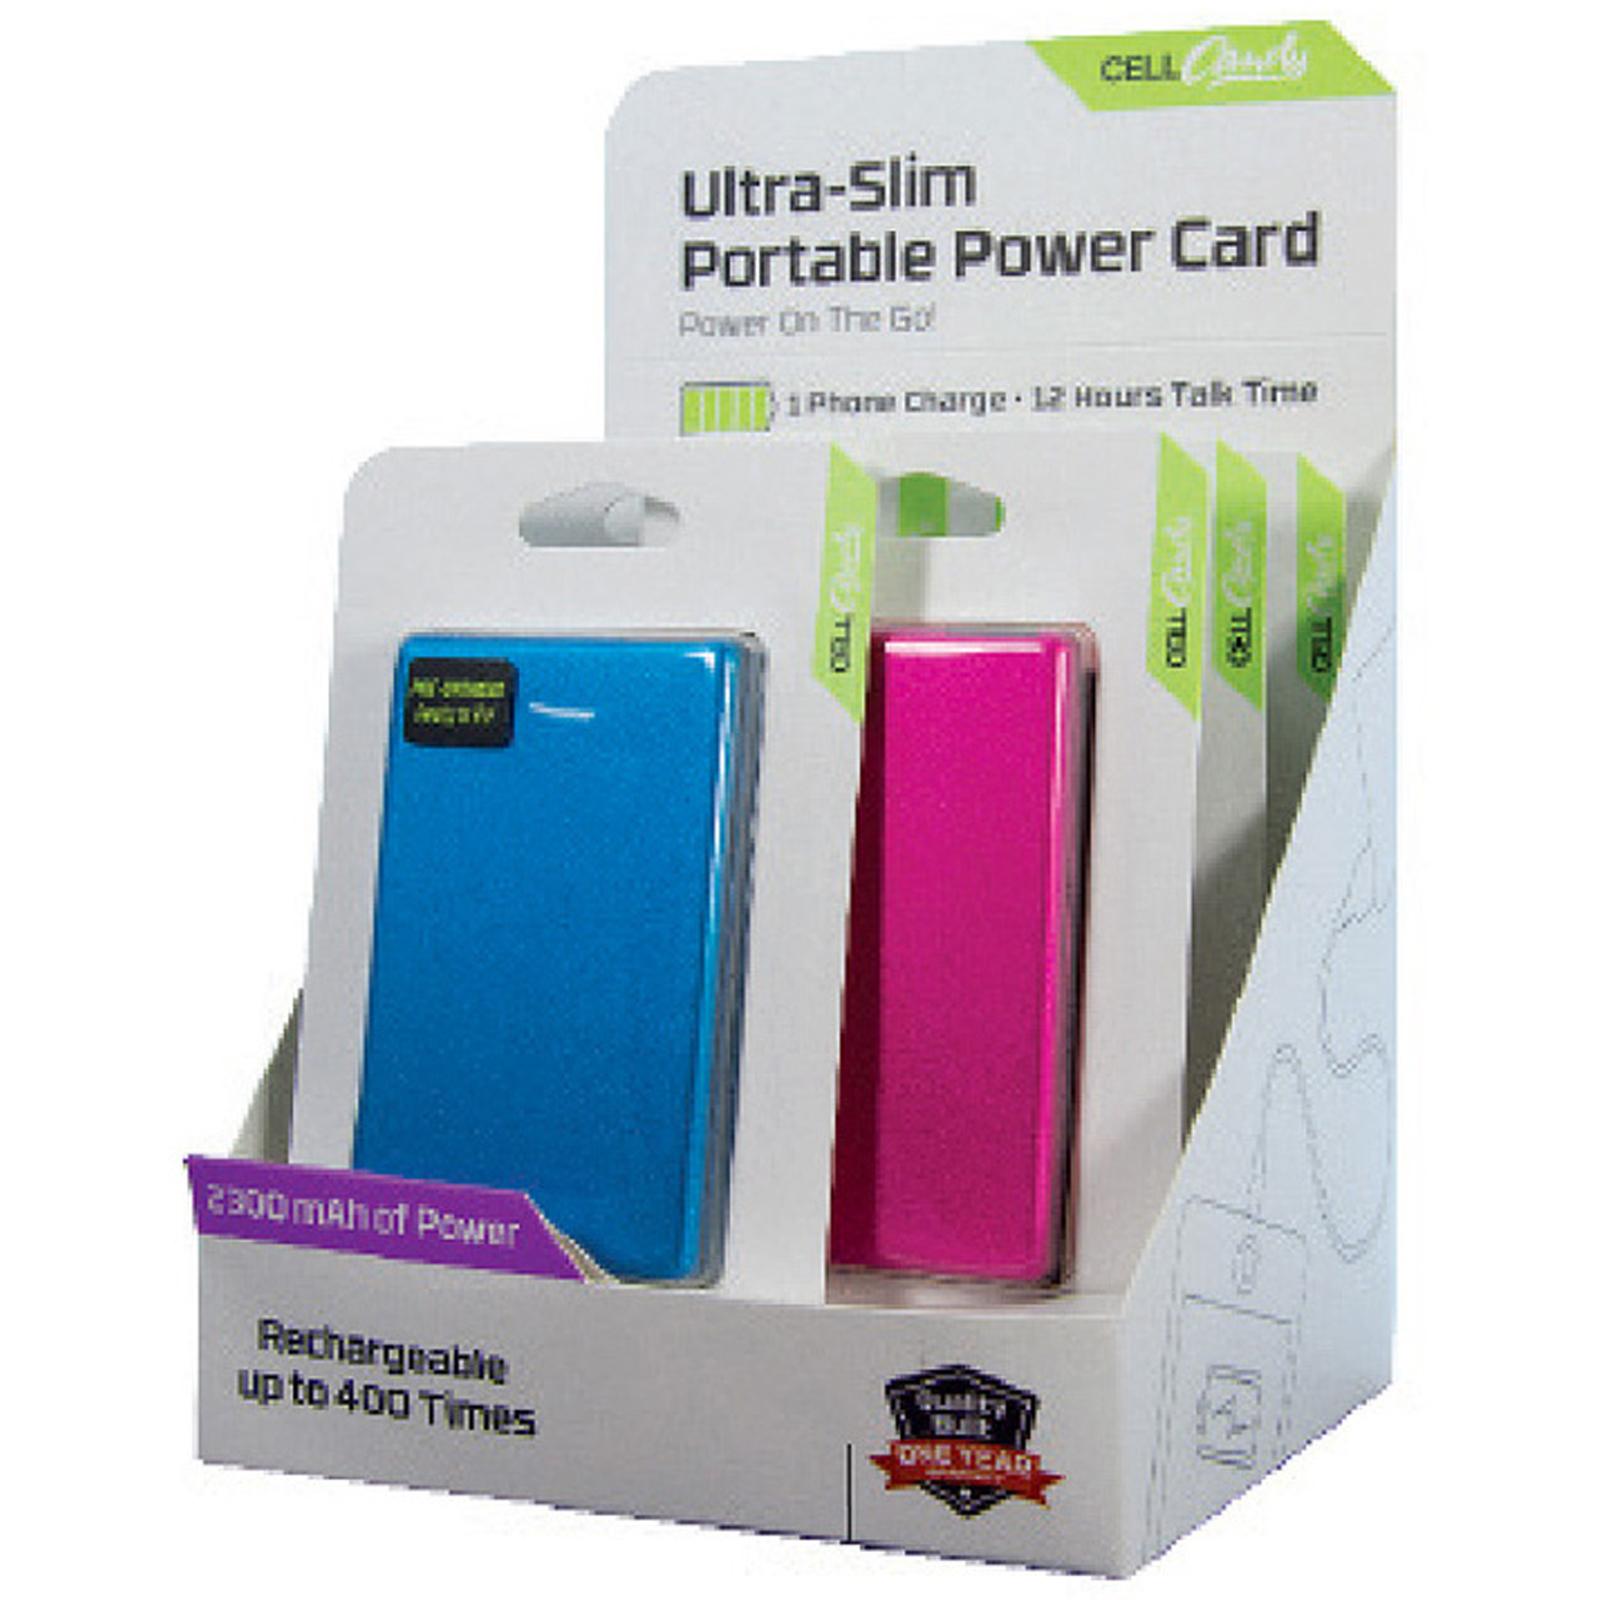 6 Piece, 2300mAh Slim Credit Card Power Banks Filled Counter Display